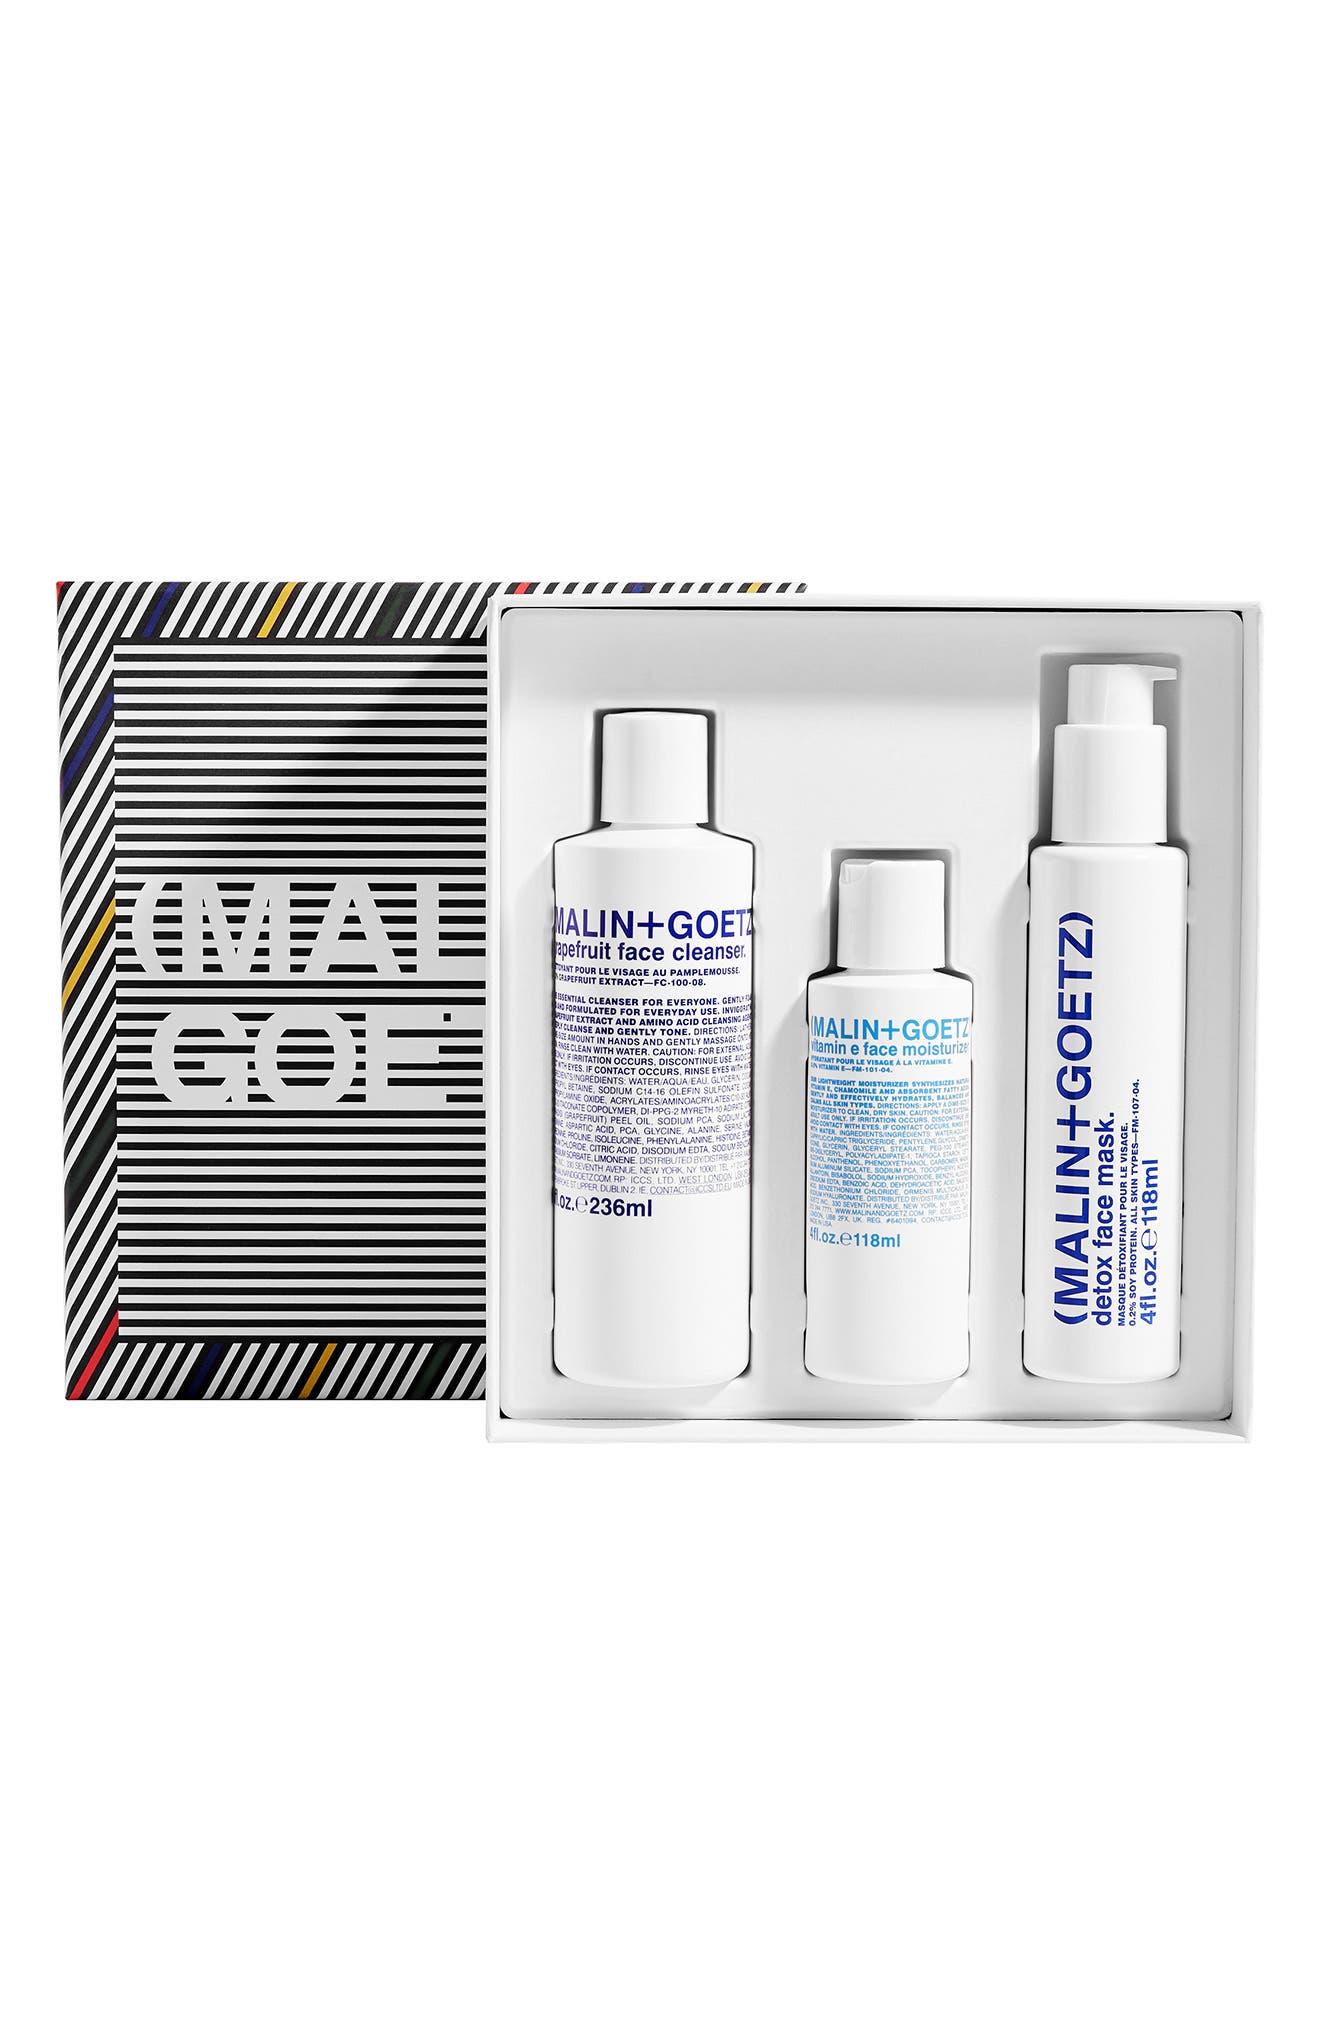 MALIN+GOETZ Saving Face Skin Care Set USD $132 Value in No Color at Nordstrom